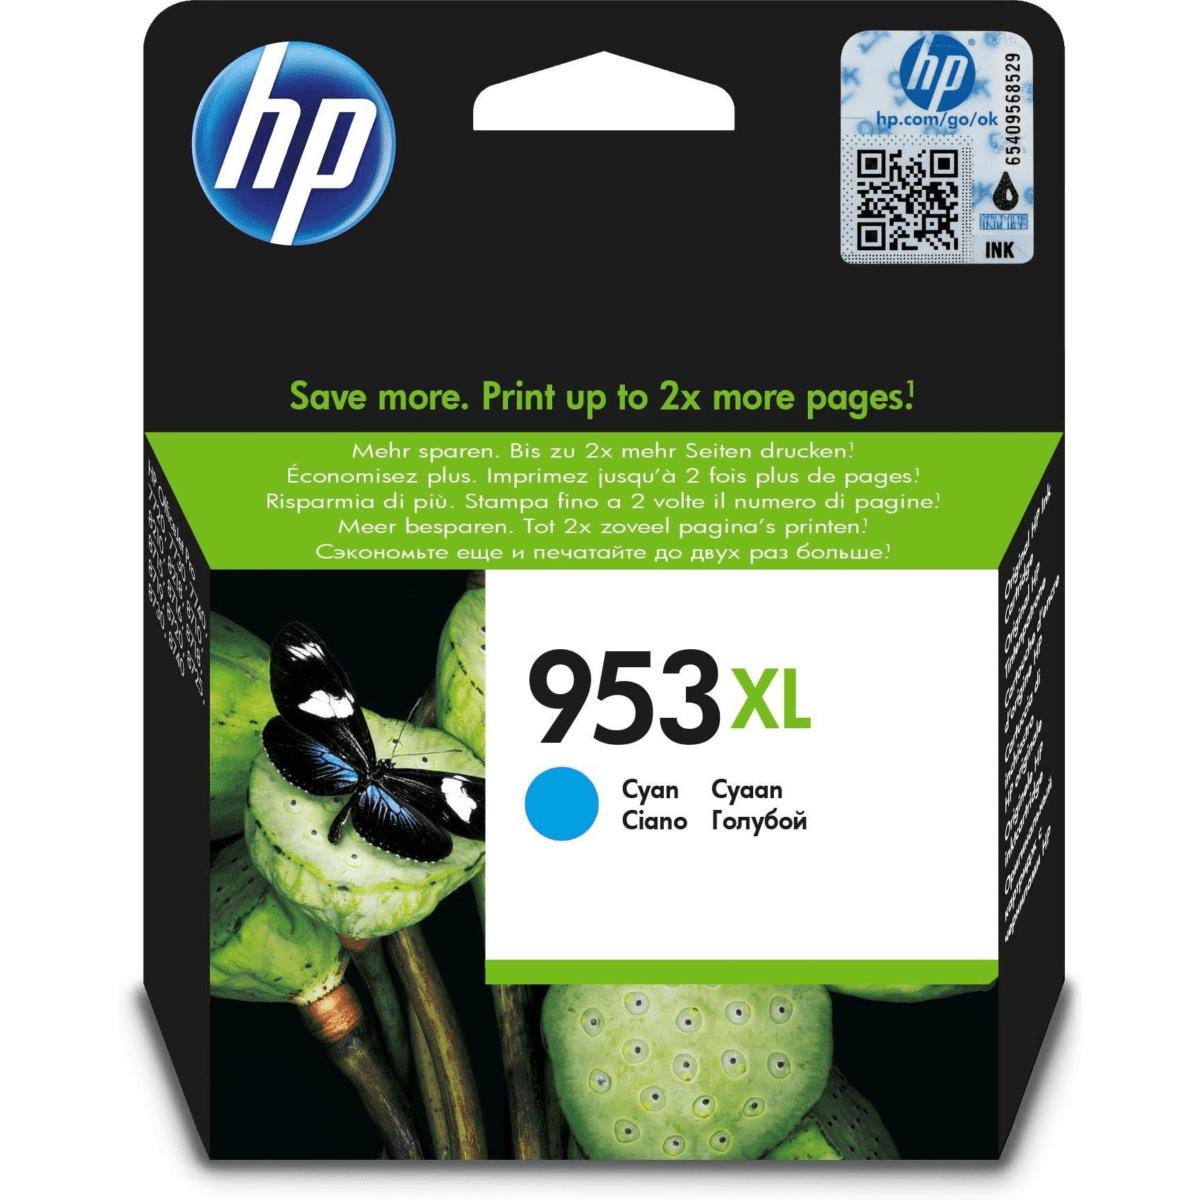 HP 953XL Cyan High Yield Printer Ink Cartridge Original F6U16AE Single-pack